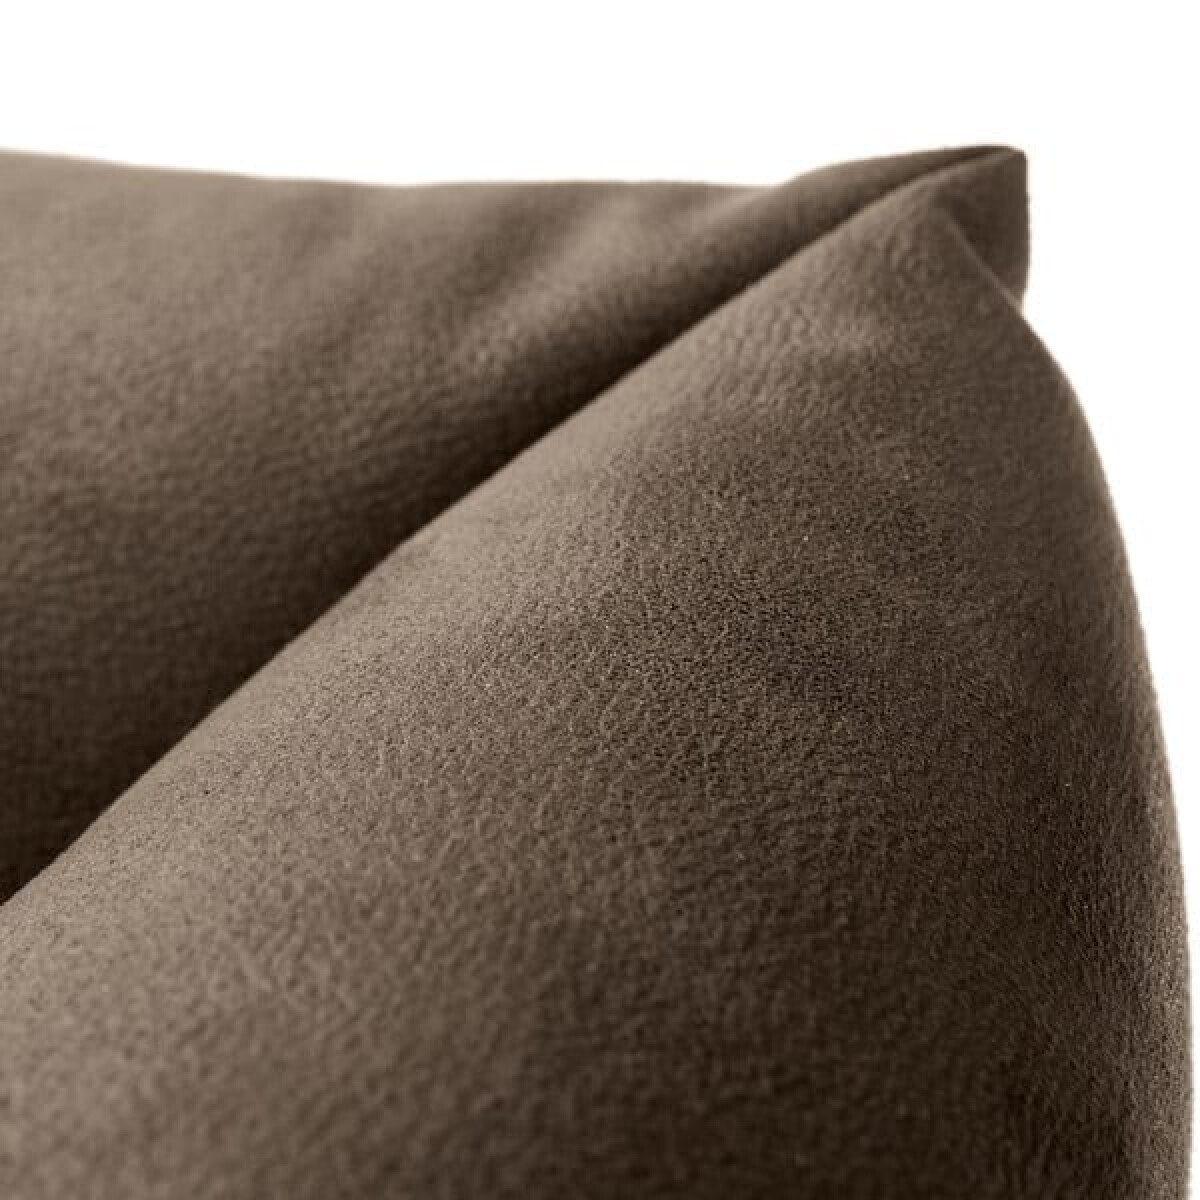 Hunter krevet Bologna 90x70cm - closeup